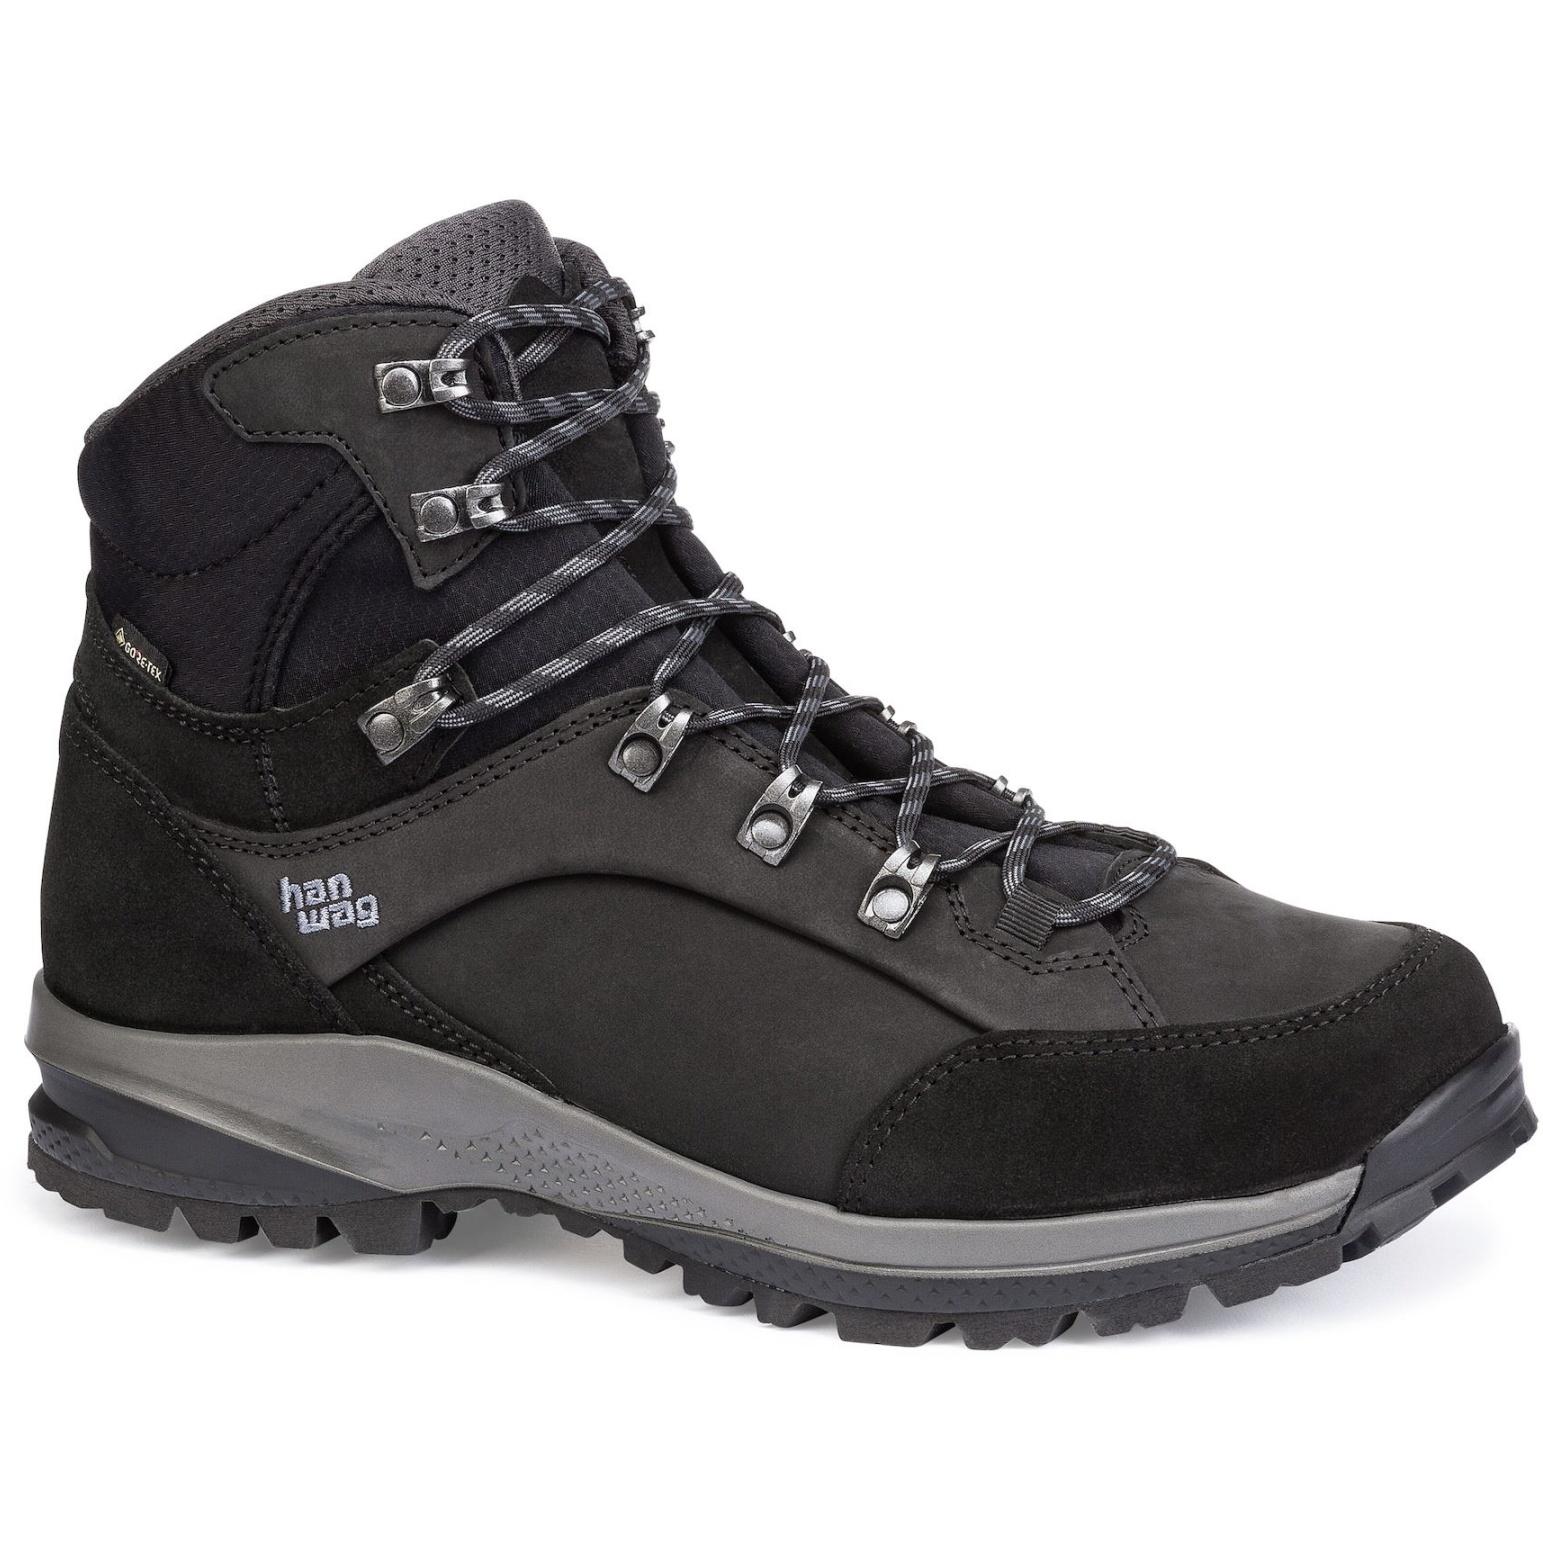 Hanwag Banks SF Extra GTX Shoe - Black/Asphalt